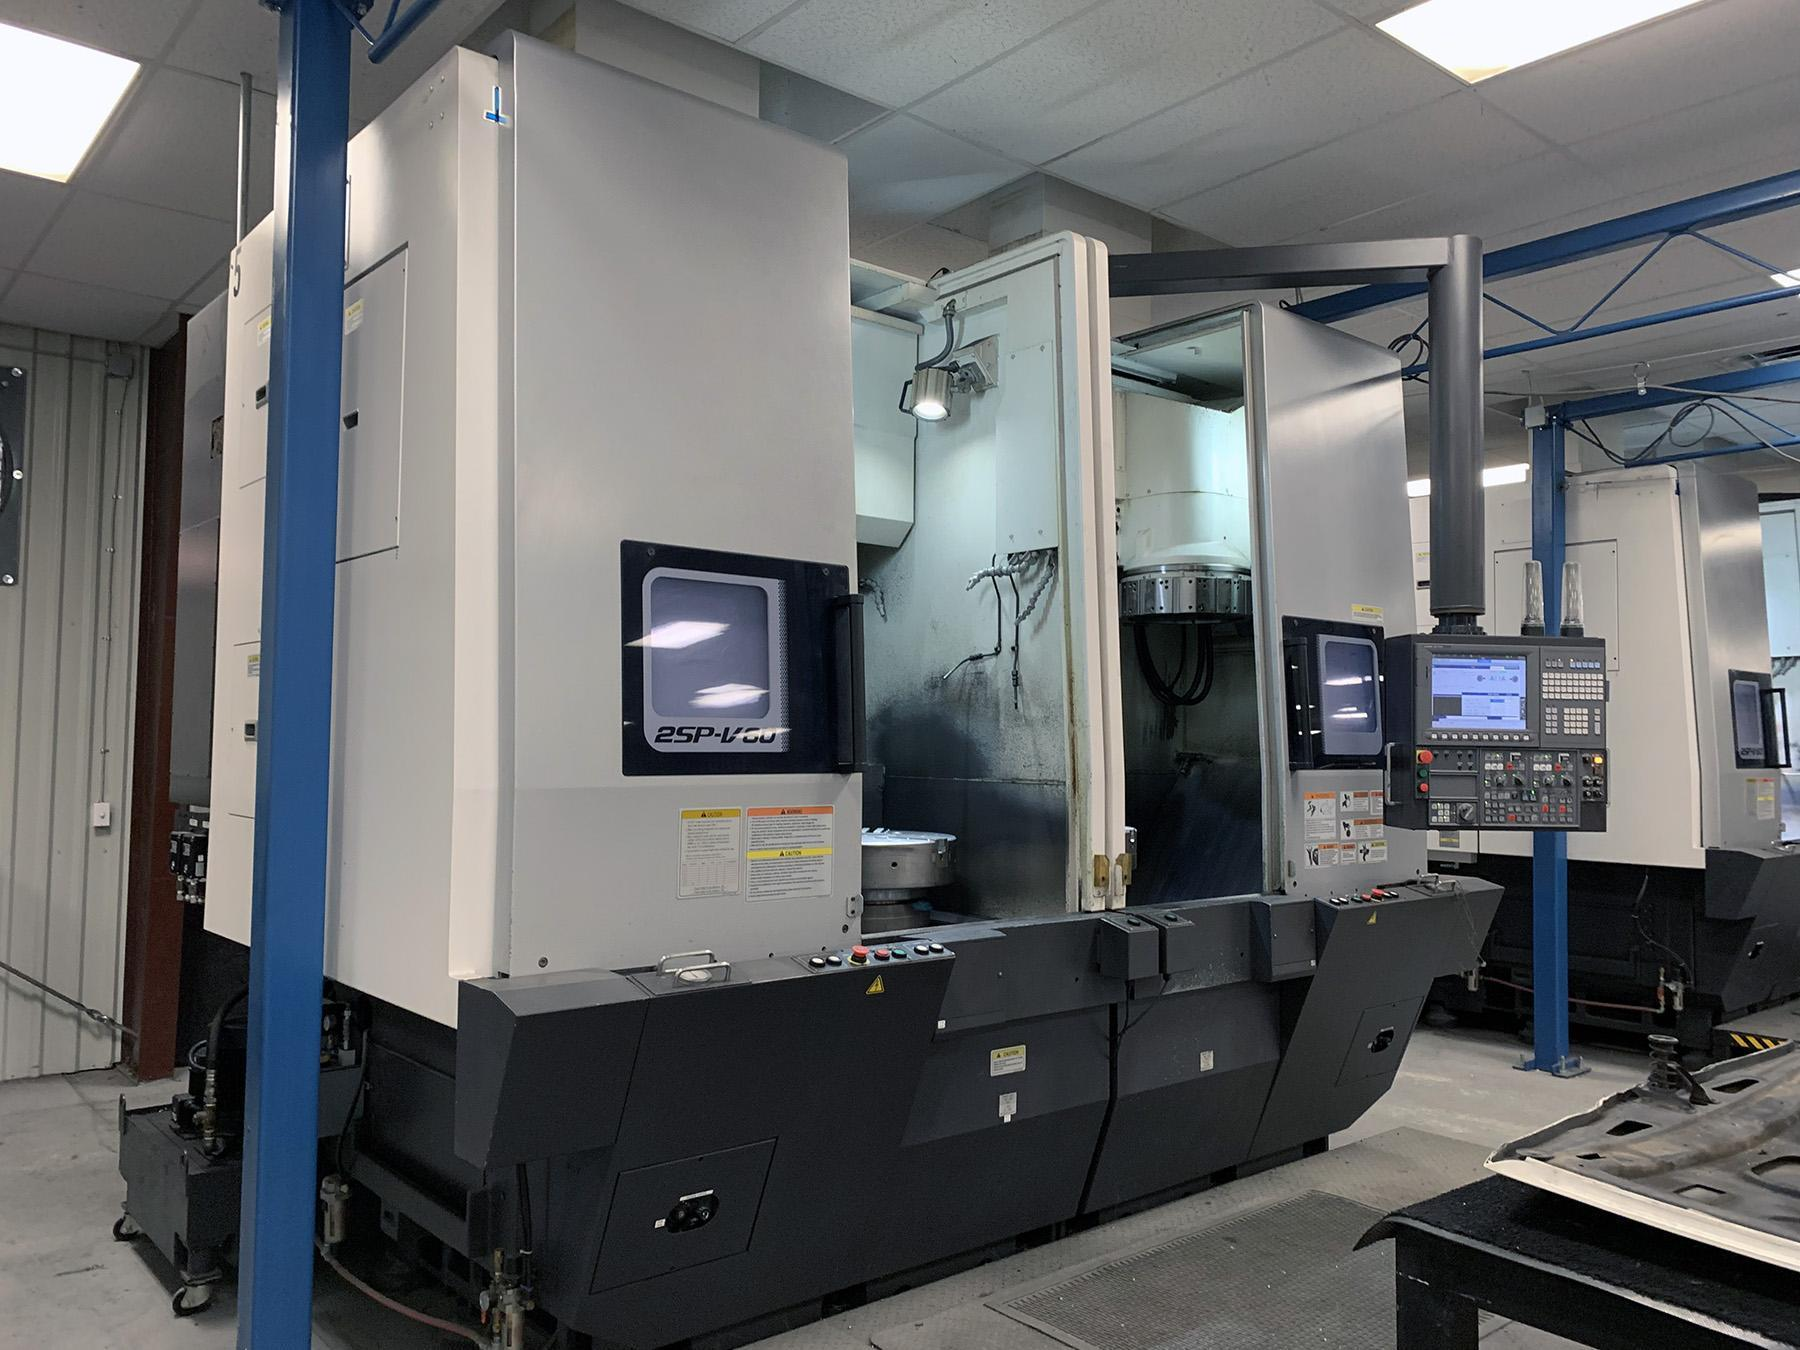 USED, OKUMA 2SP-V60 CNC TWIN SPINDLE VERTICAL TURNING CENTER